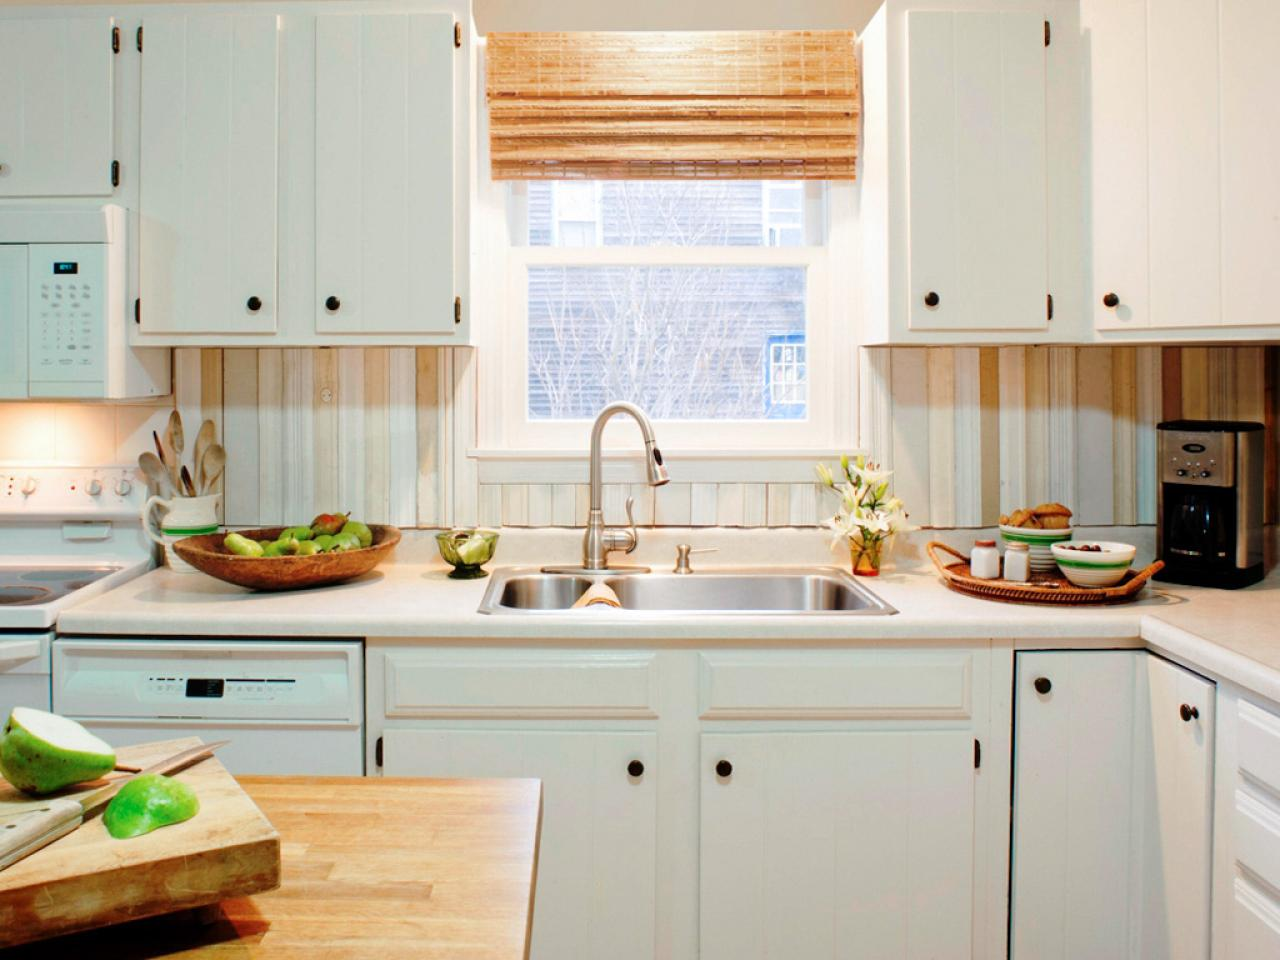 9+] Wallpaper Designs for Kitchen Backsplash on WallpaperSafari